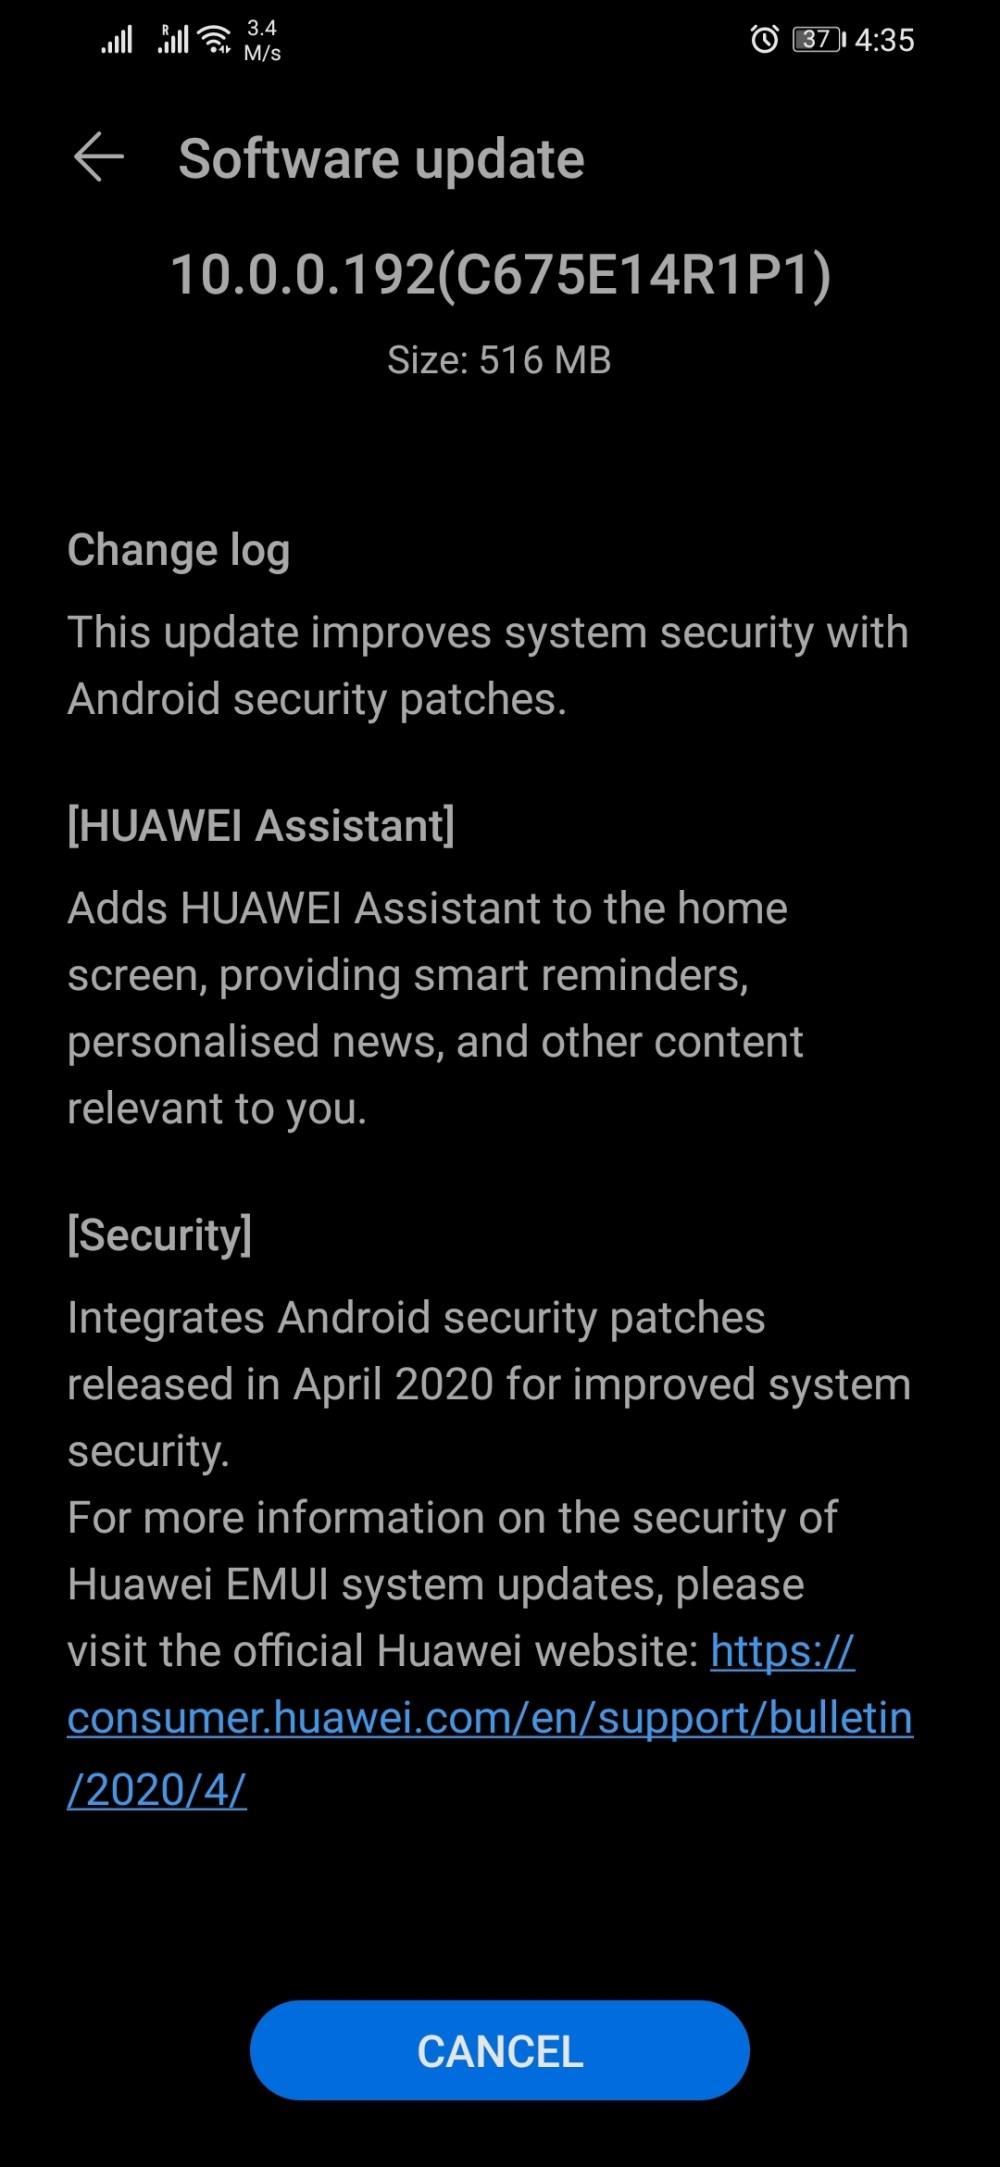 Honor 8X EMUI 10.0.0.192